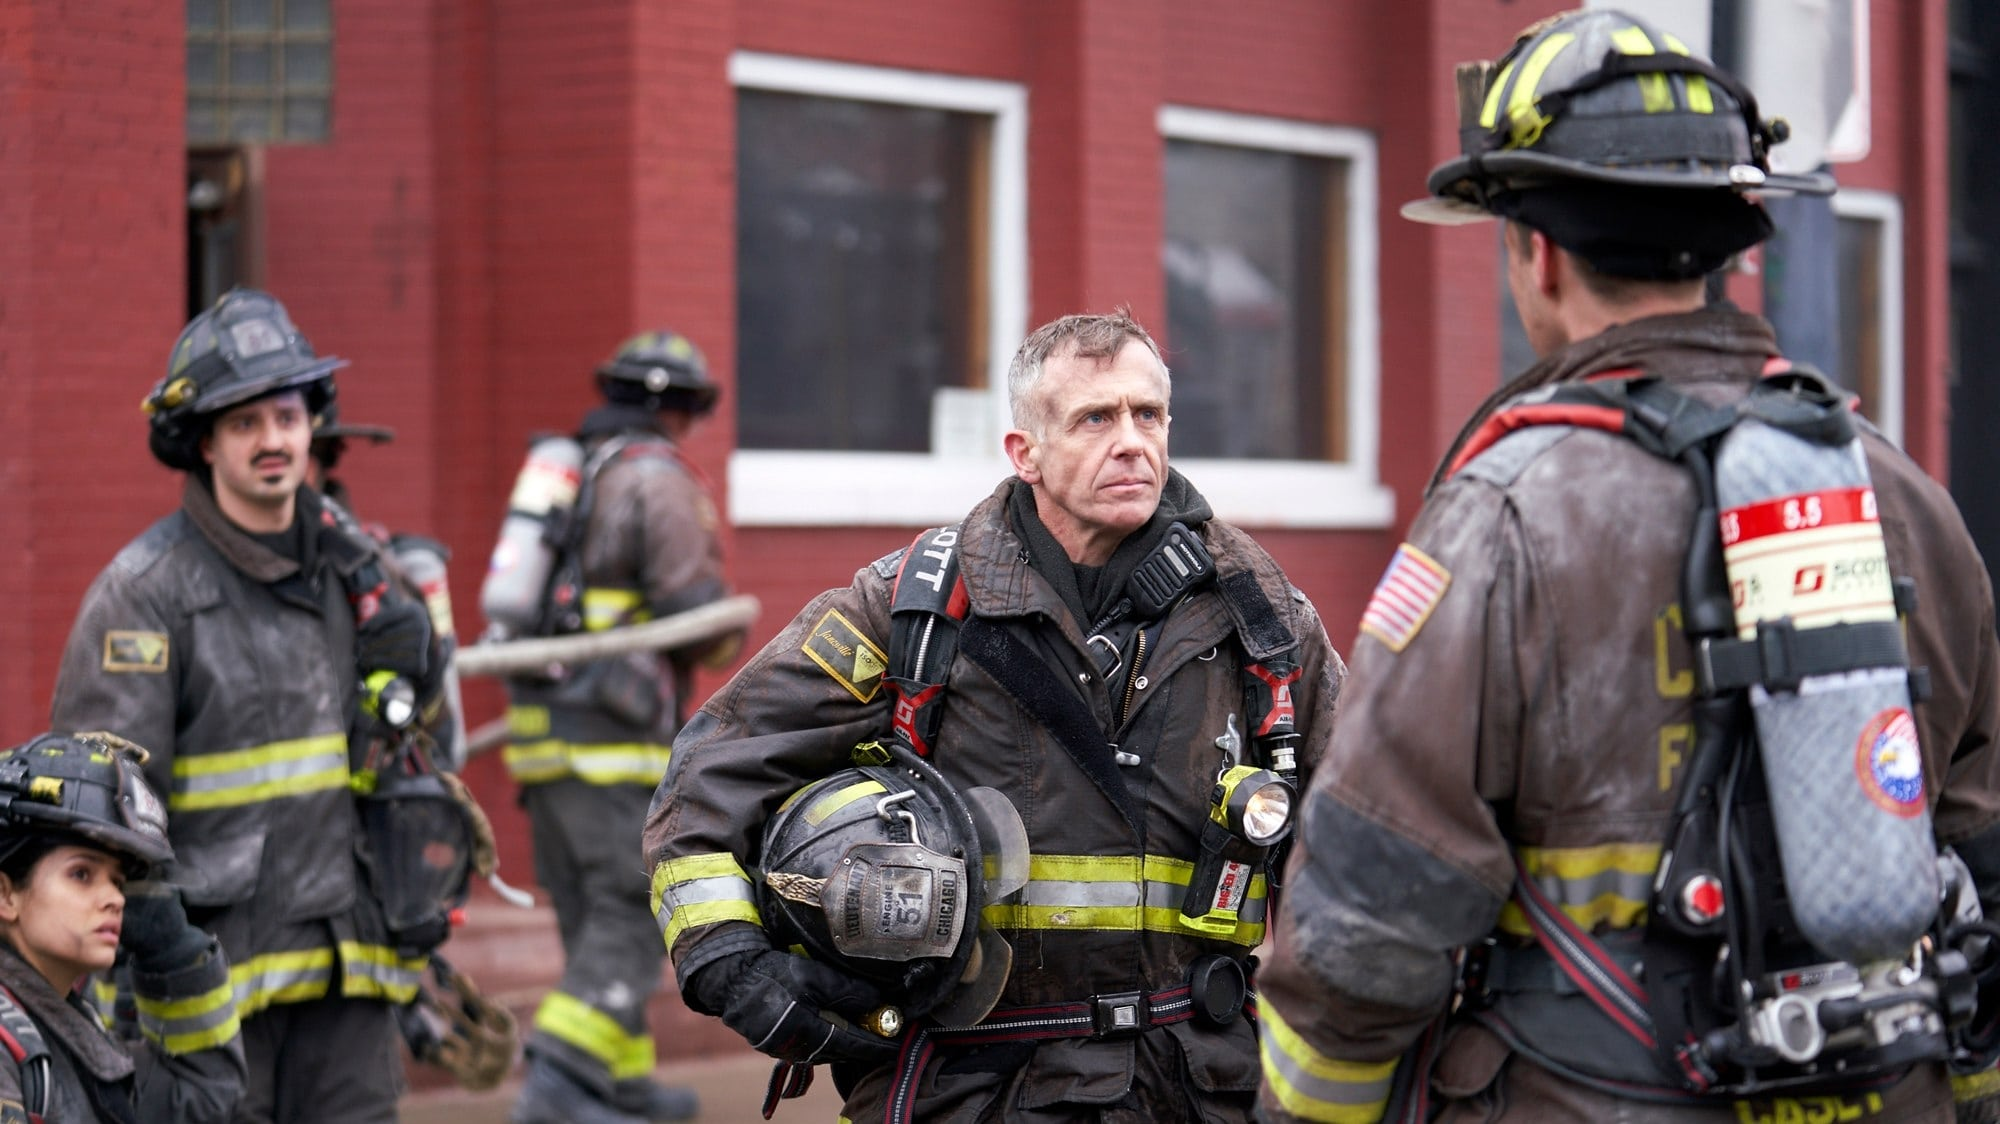 chicago fire season 1 episode 8 tubeplus